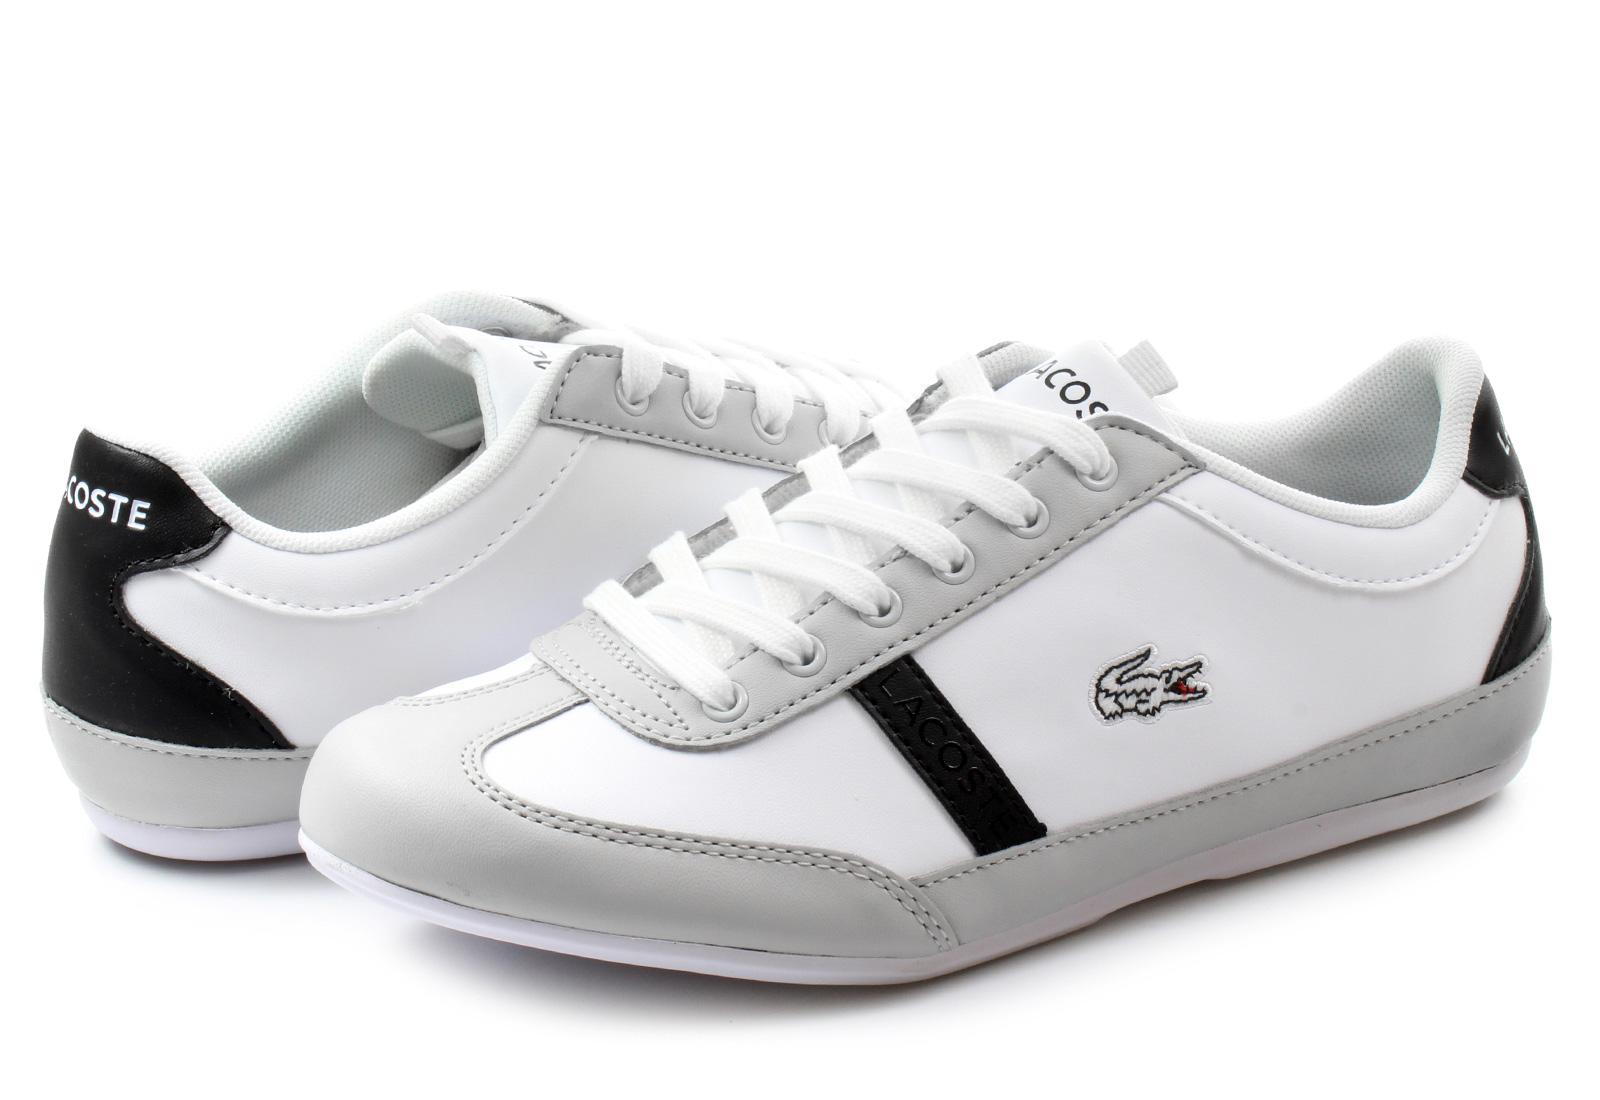 lacoste shoes misano sport 151spj0111 147